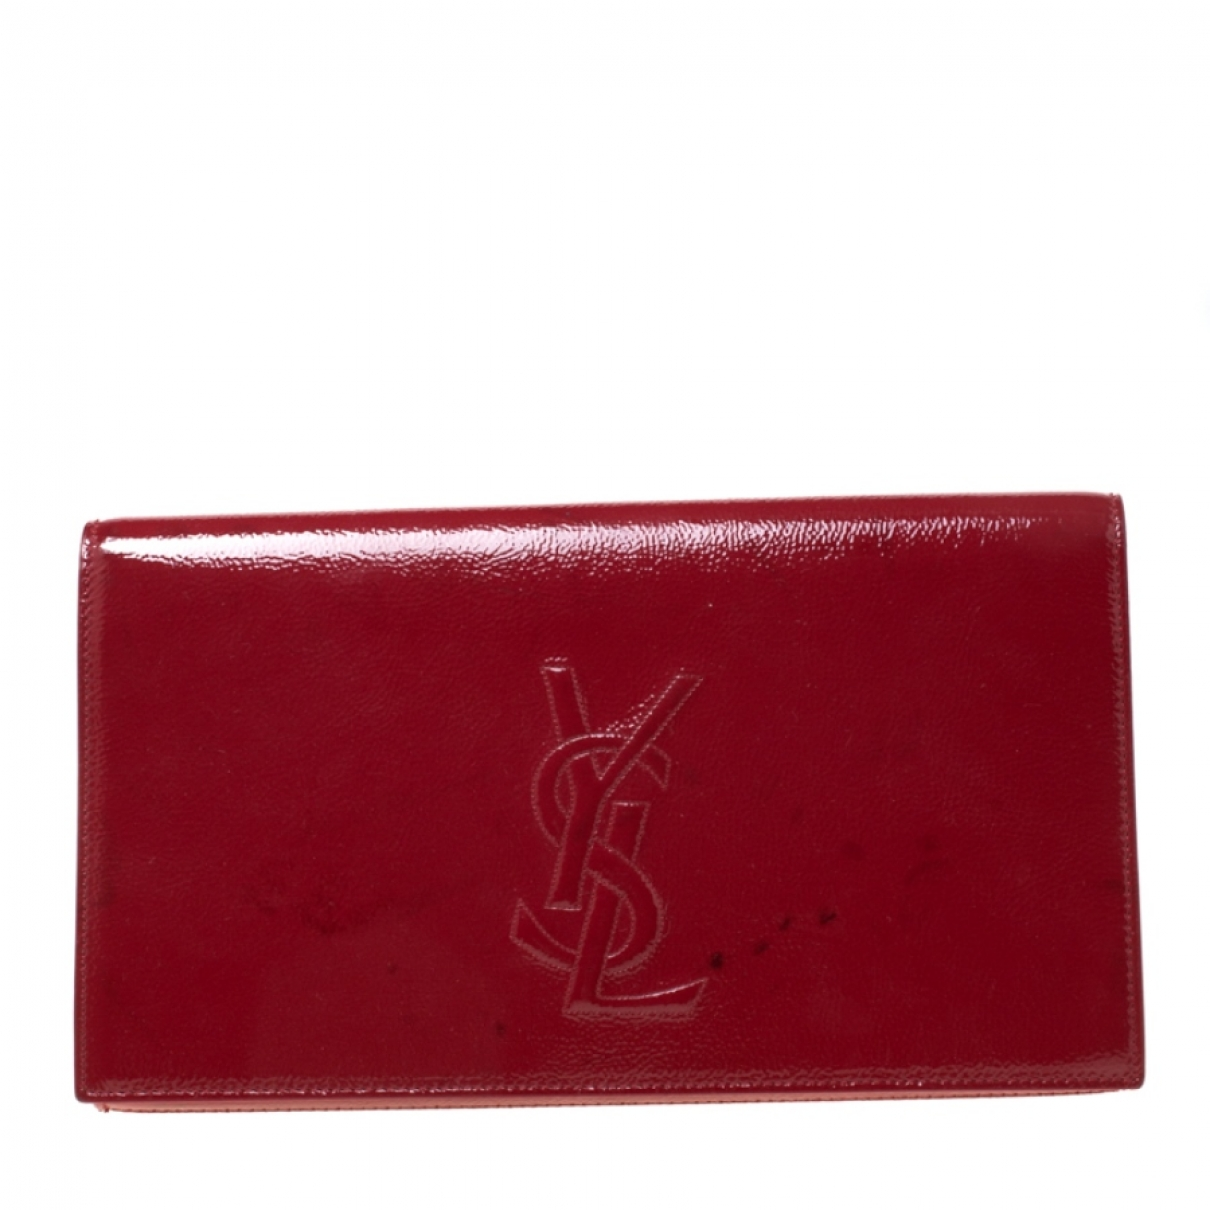 Yves Saint Laurent Belle de Jour Red Patent leather Clutch bag for Women \N